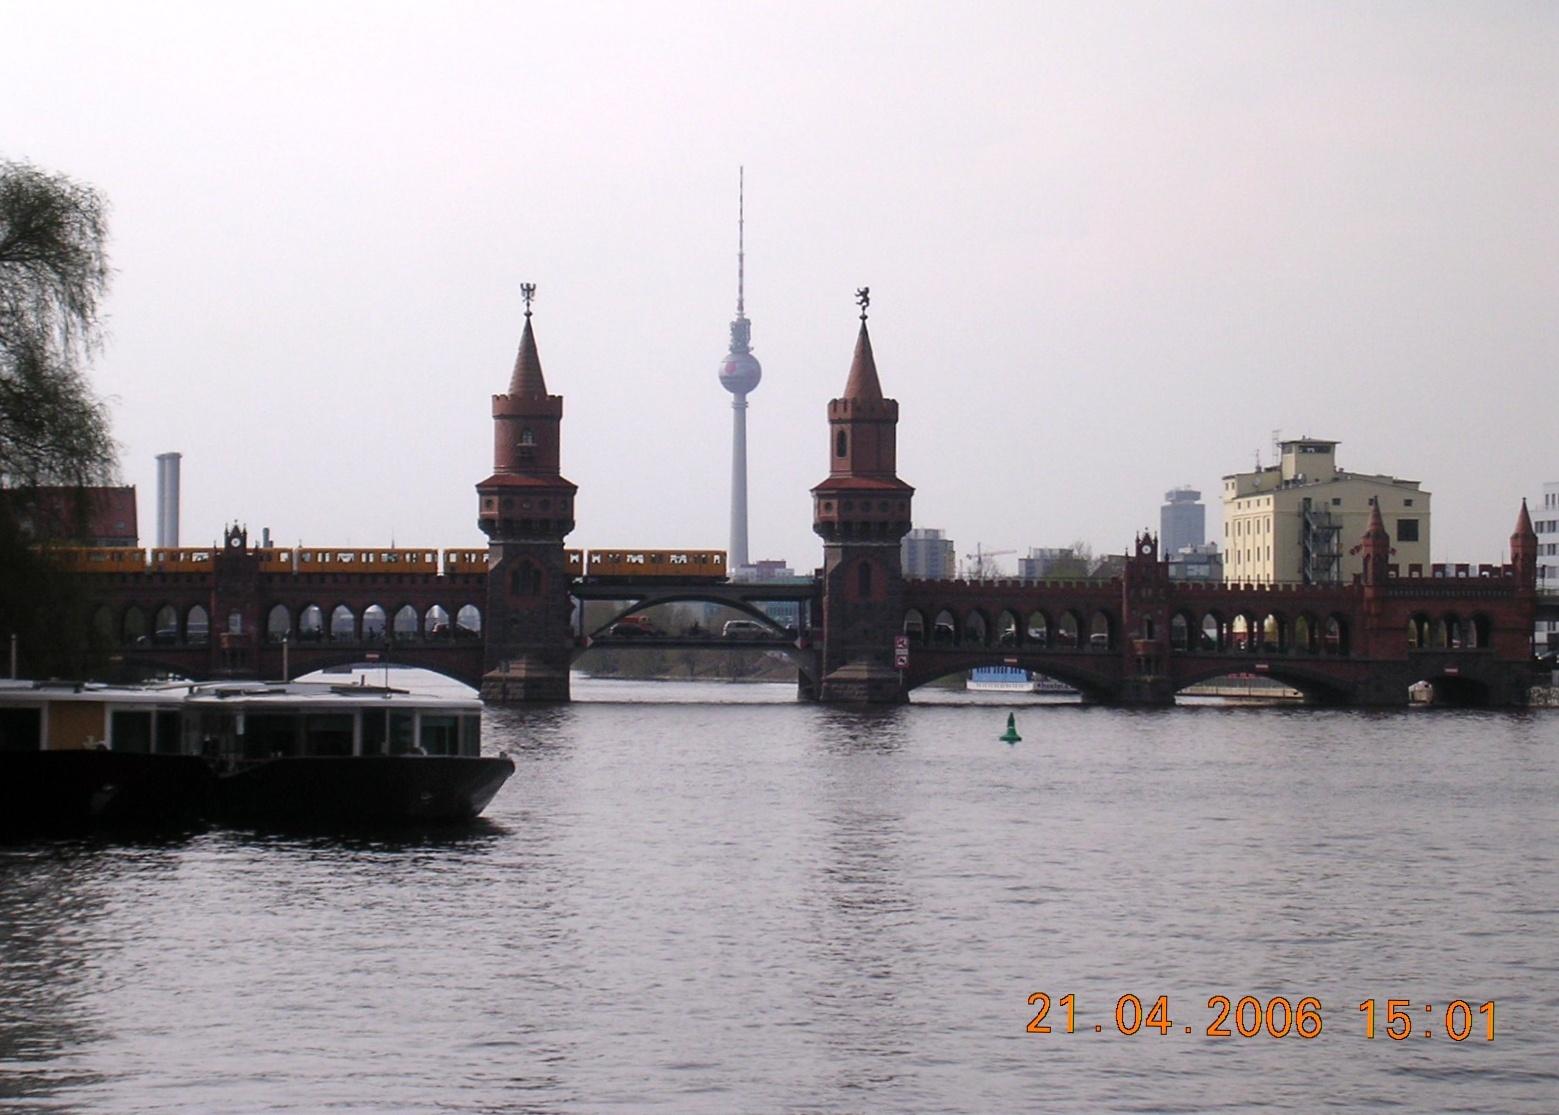 Berlin Funkturm Oberbaumbrücke